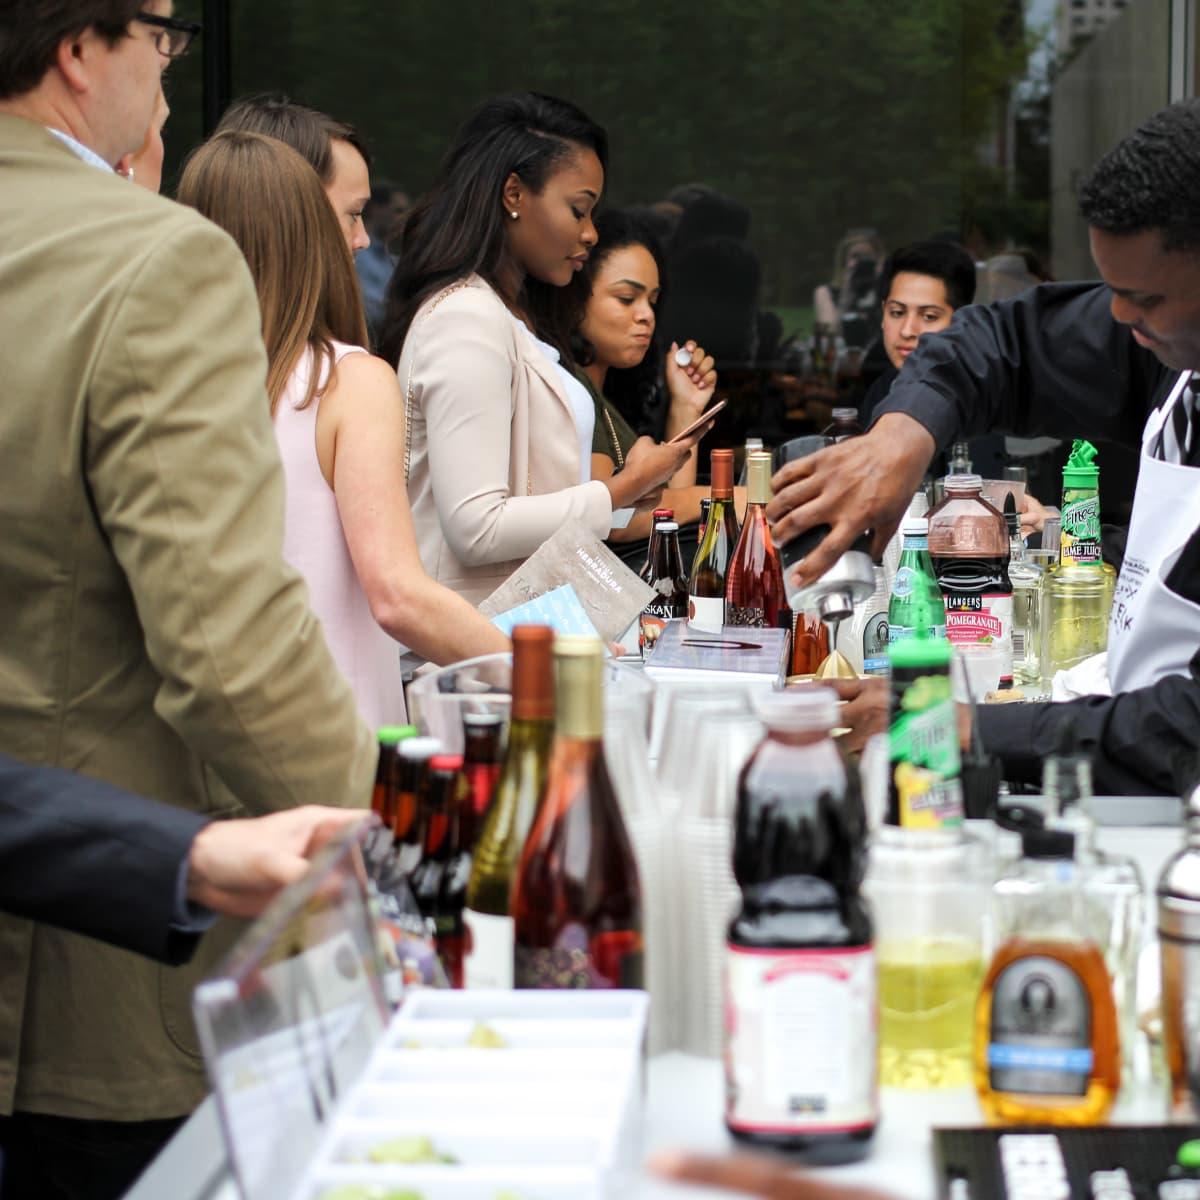 Tastemakers Houston 5/16  pours